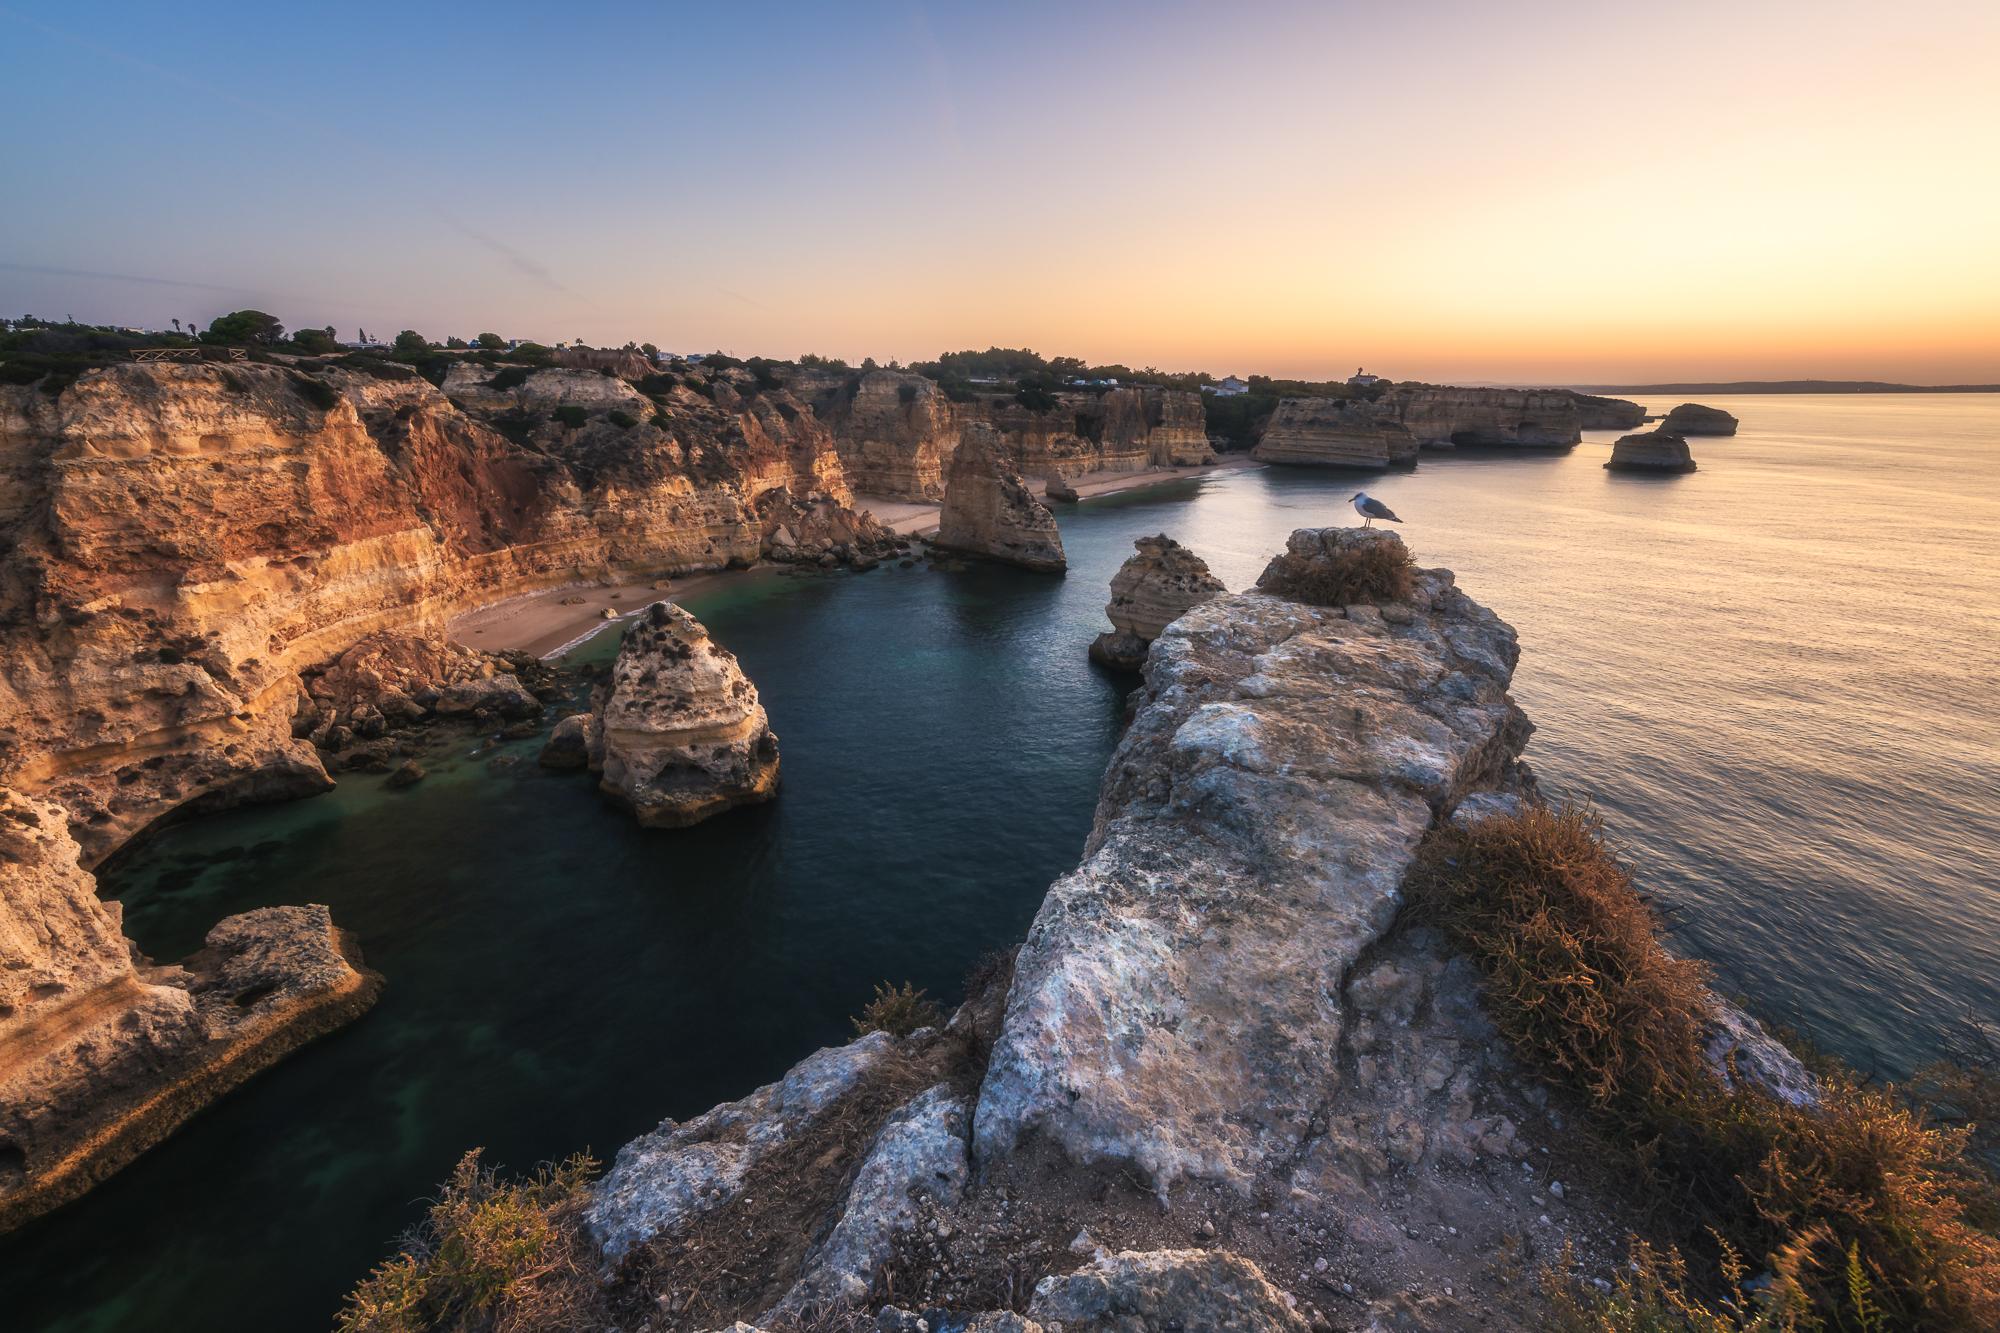 Portugal, Algarve, Region, Praia da Marinha, Klippen, Cliffs, Rocks, Felsen, Strand, Beach, Reise, Travel, Nature, Natur, Landschaft, Landscape, Europe, Sonnenuntergang, Sunset, Nikon, Nikon D850, Manfrotto, Haida, Novoflex